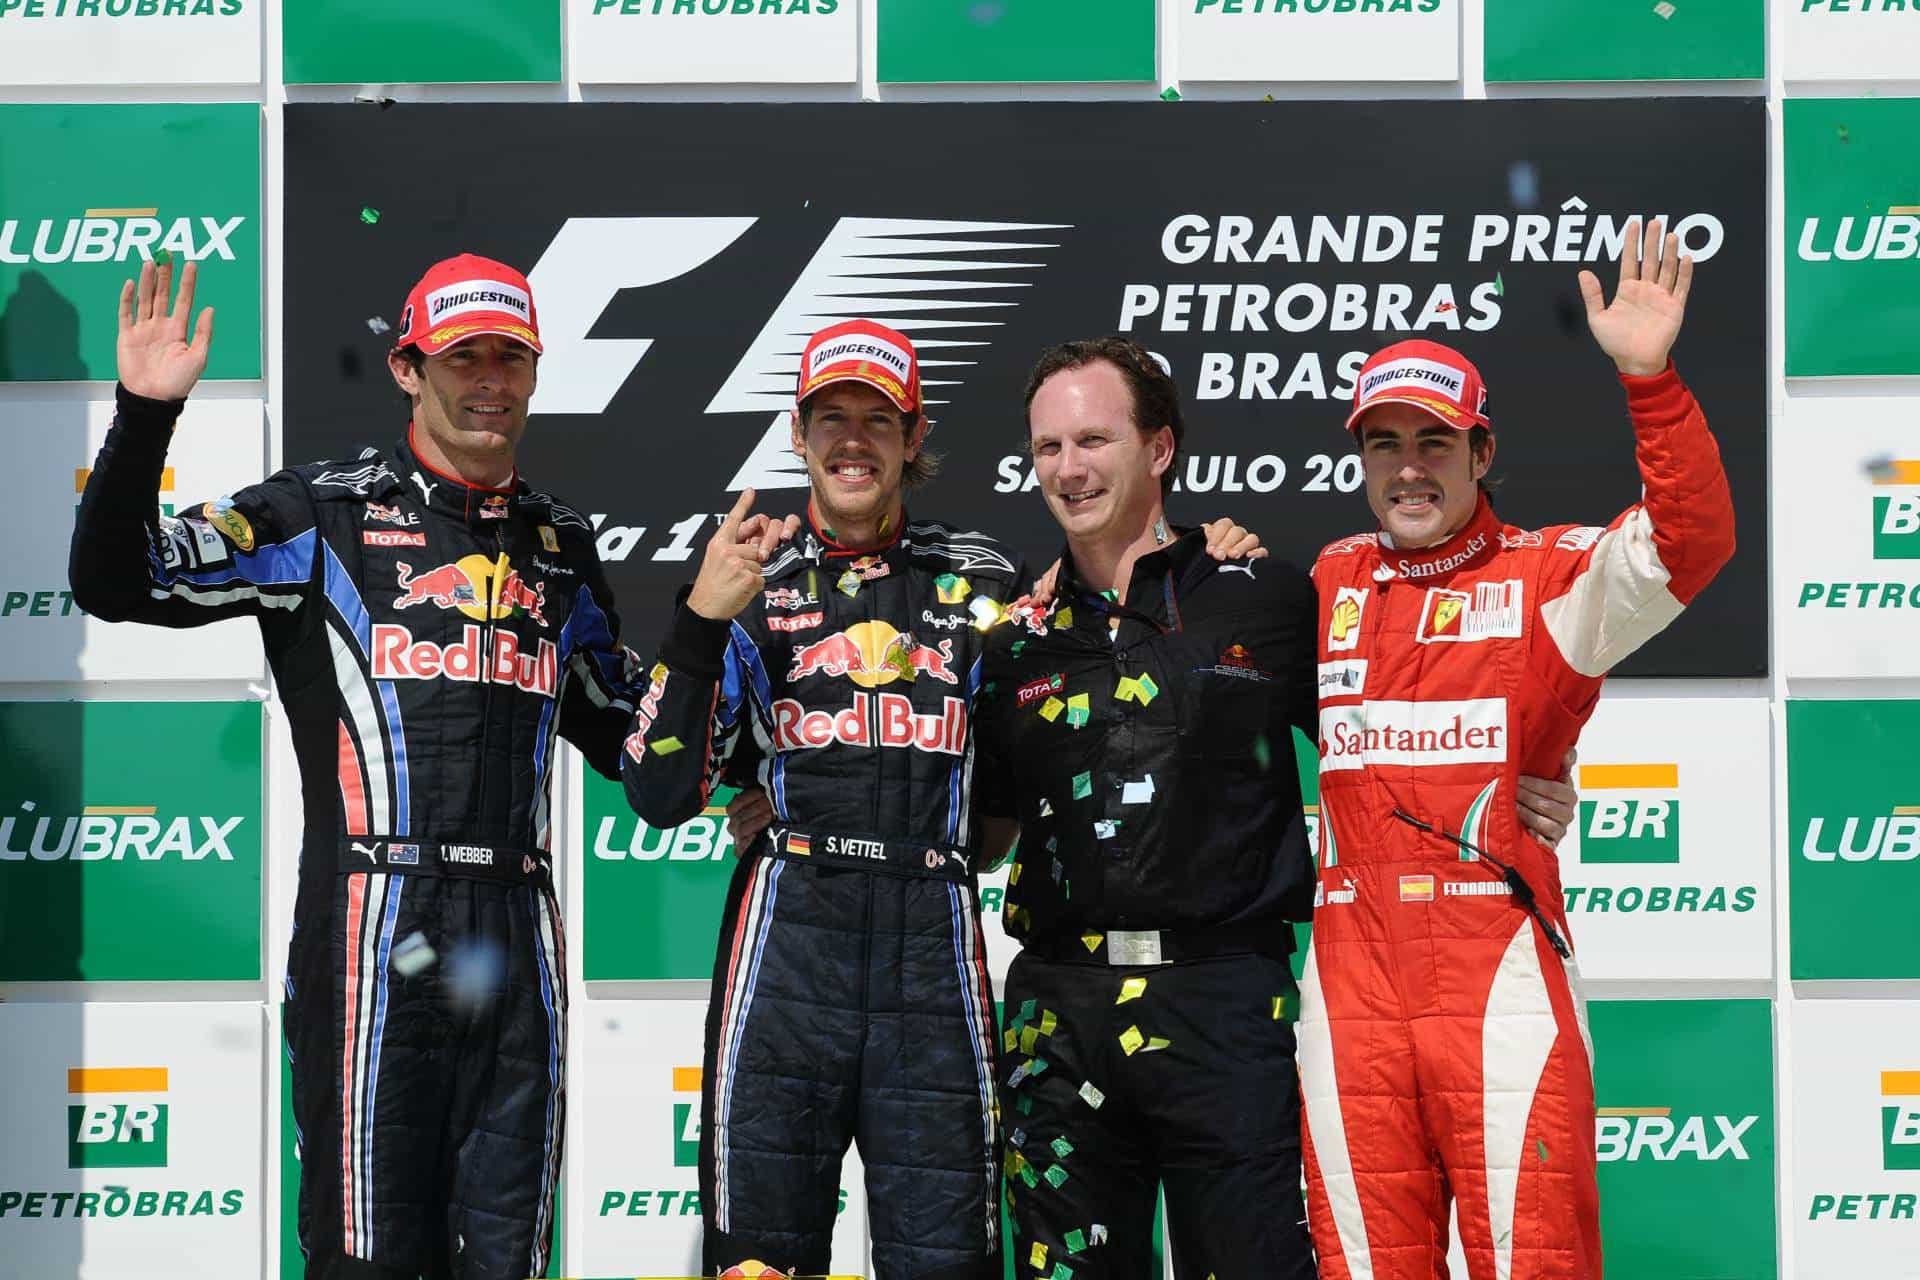 Brazilian GP F1 2010 podium Photo Ferrari